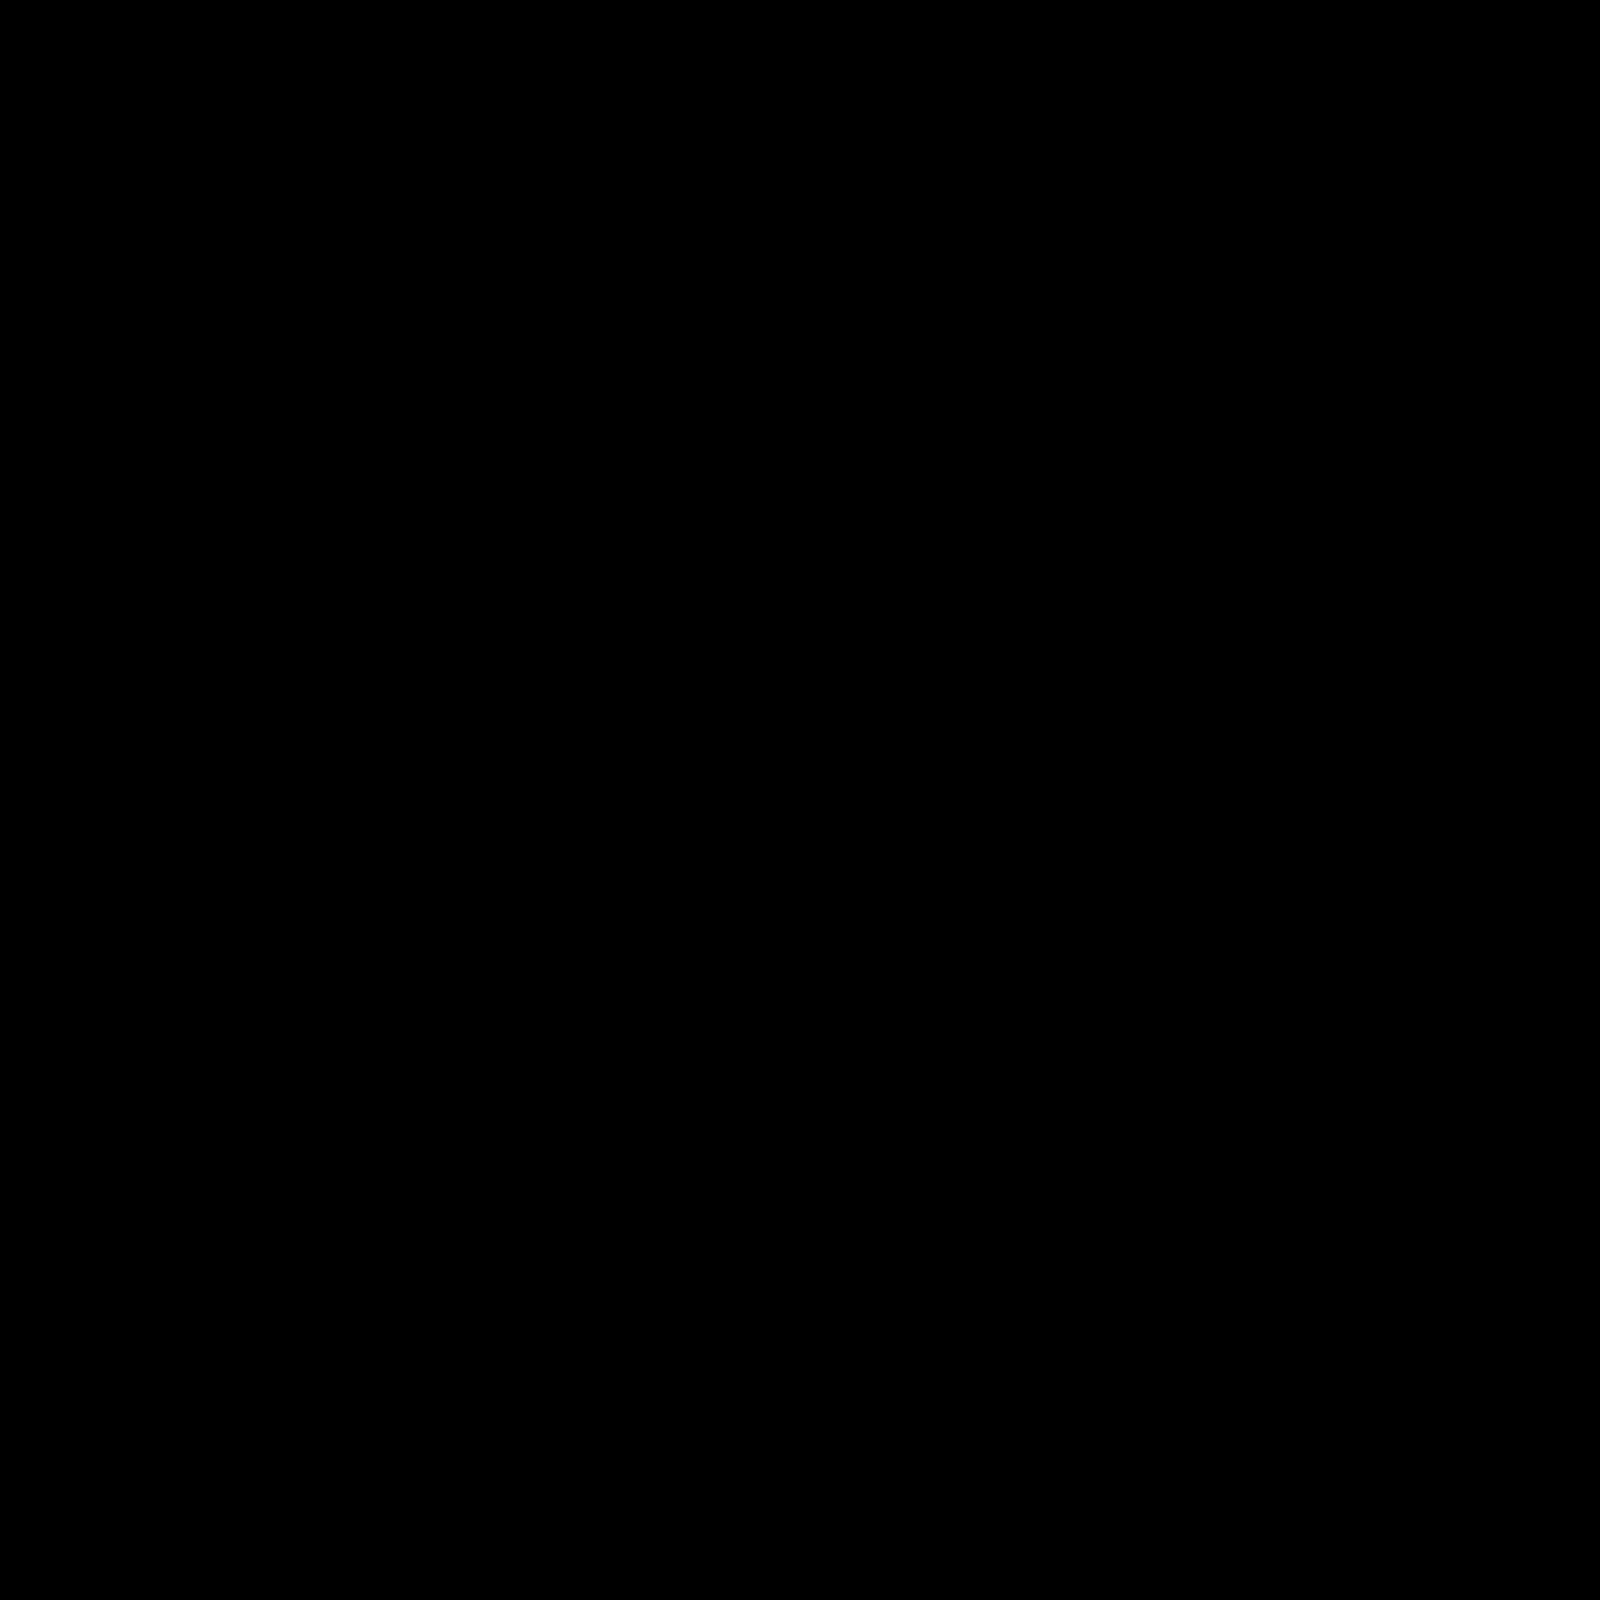 Bandit Filled icon